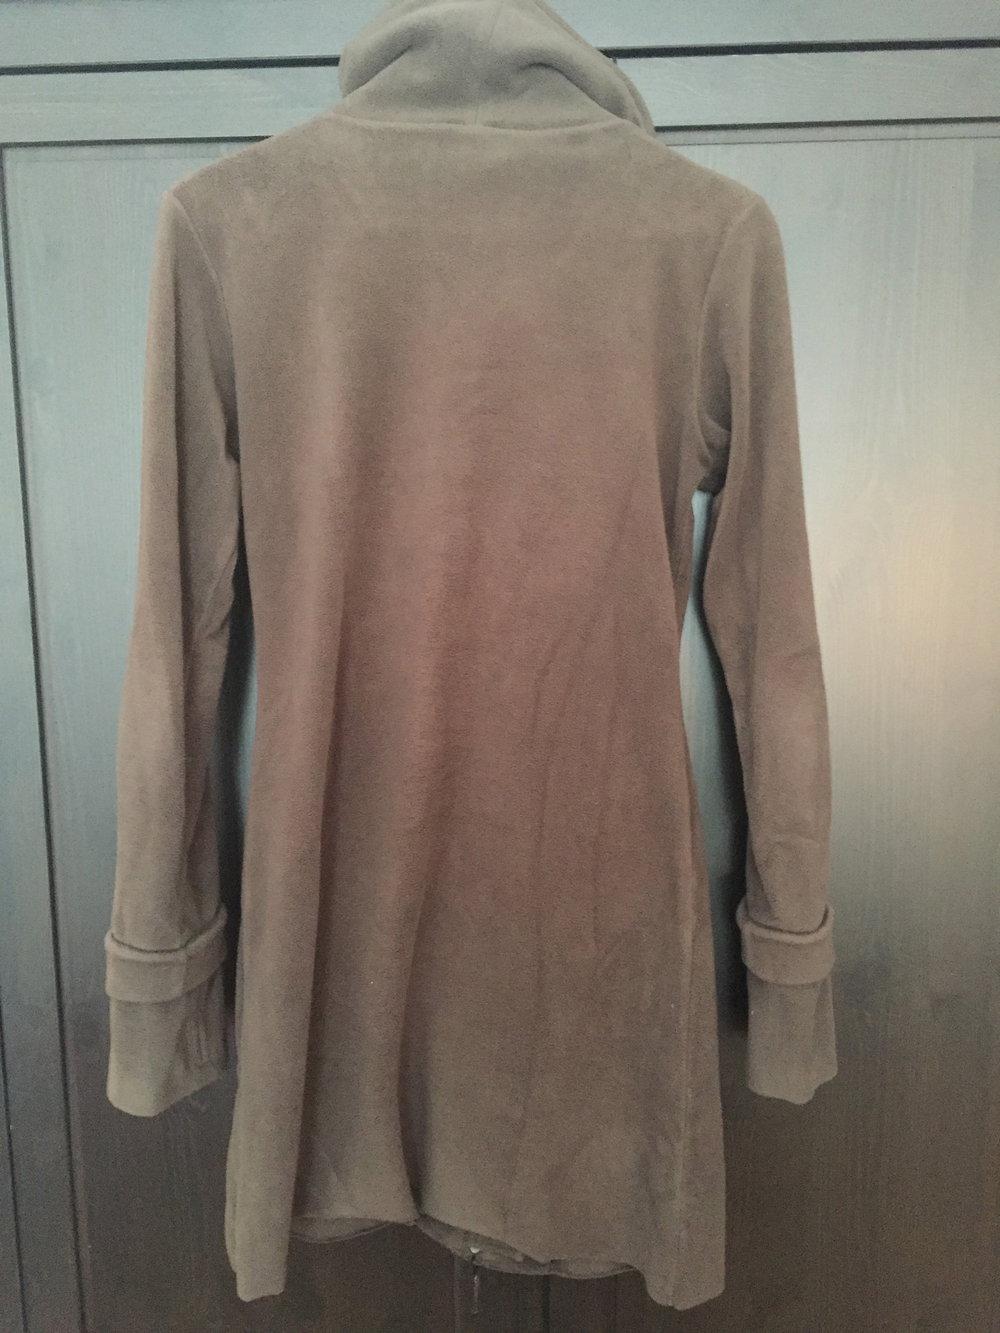 Brauner fleece mantel